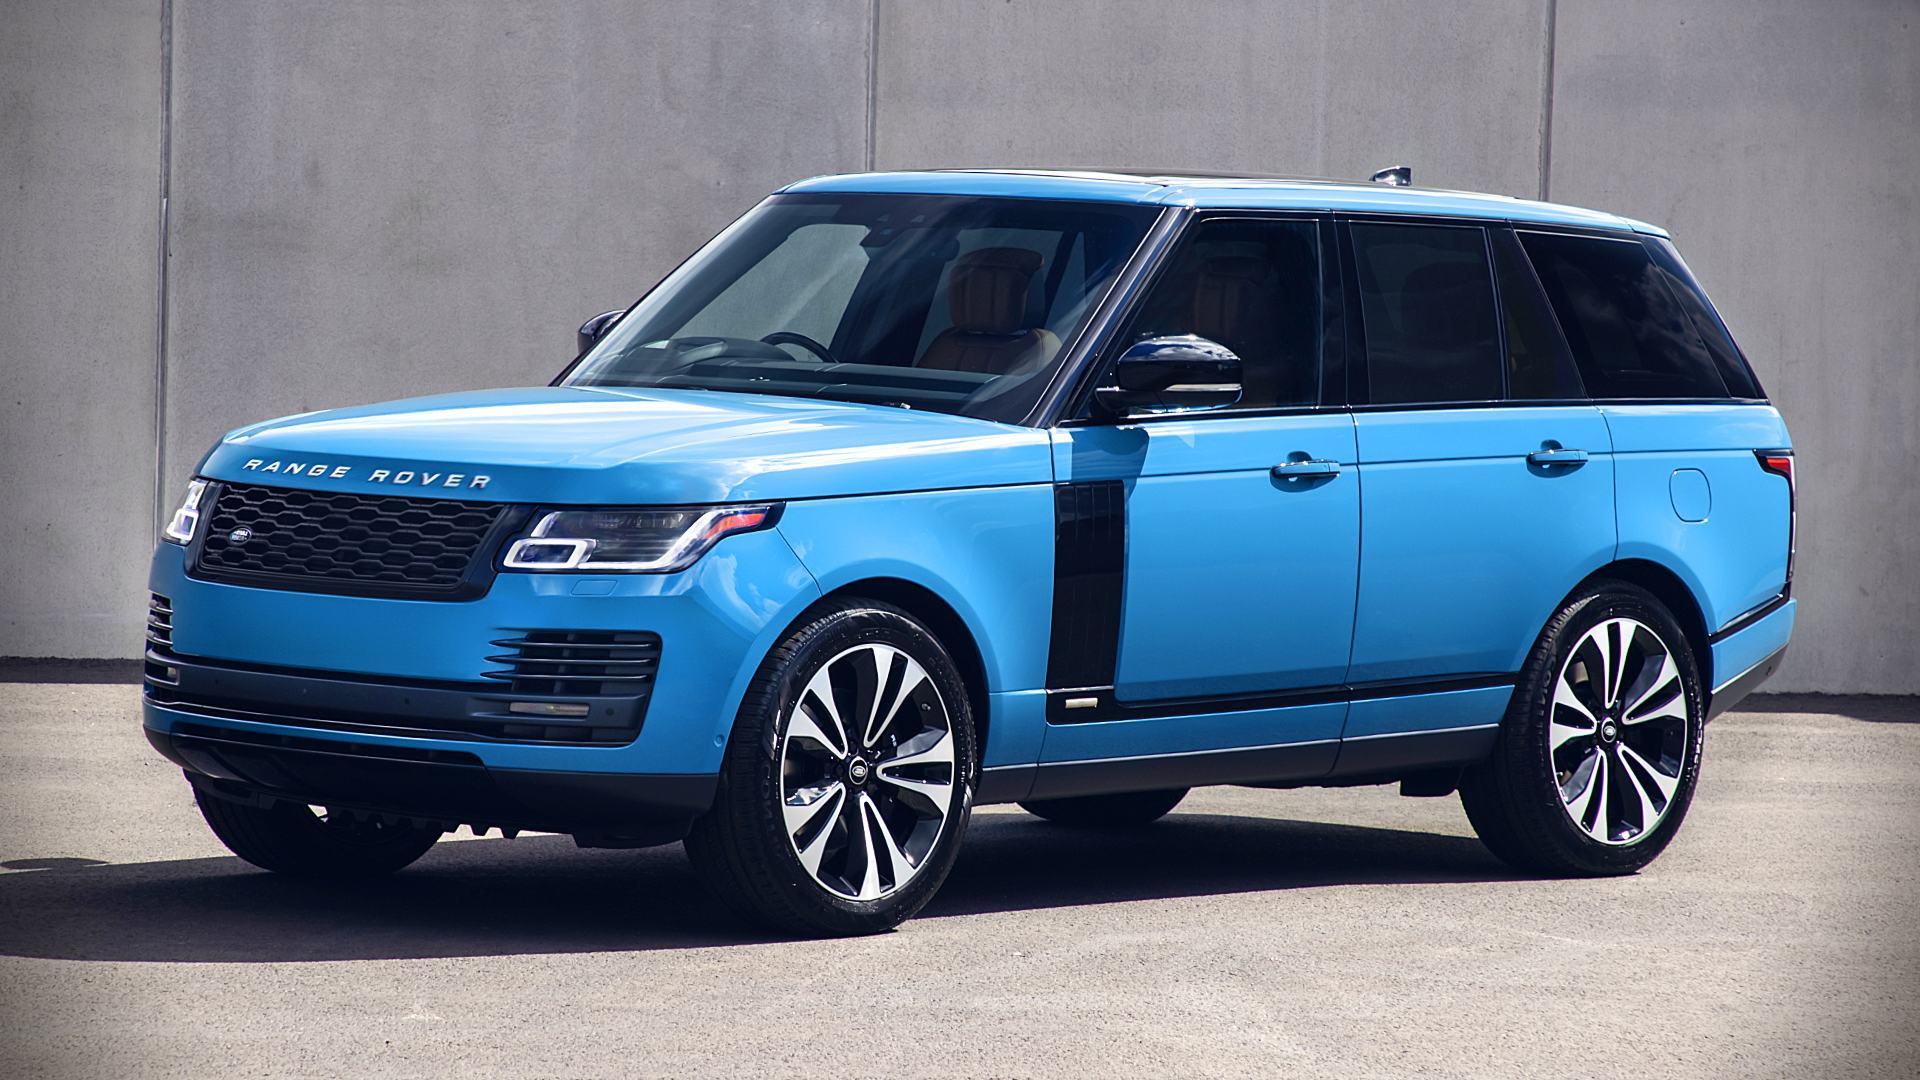 2020 Range Rover Fifty